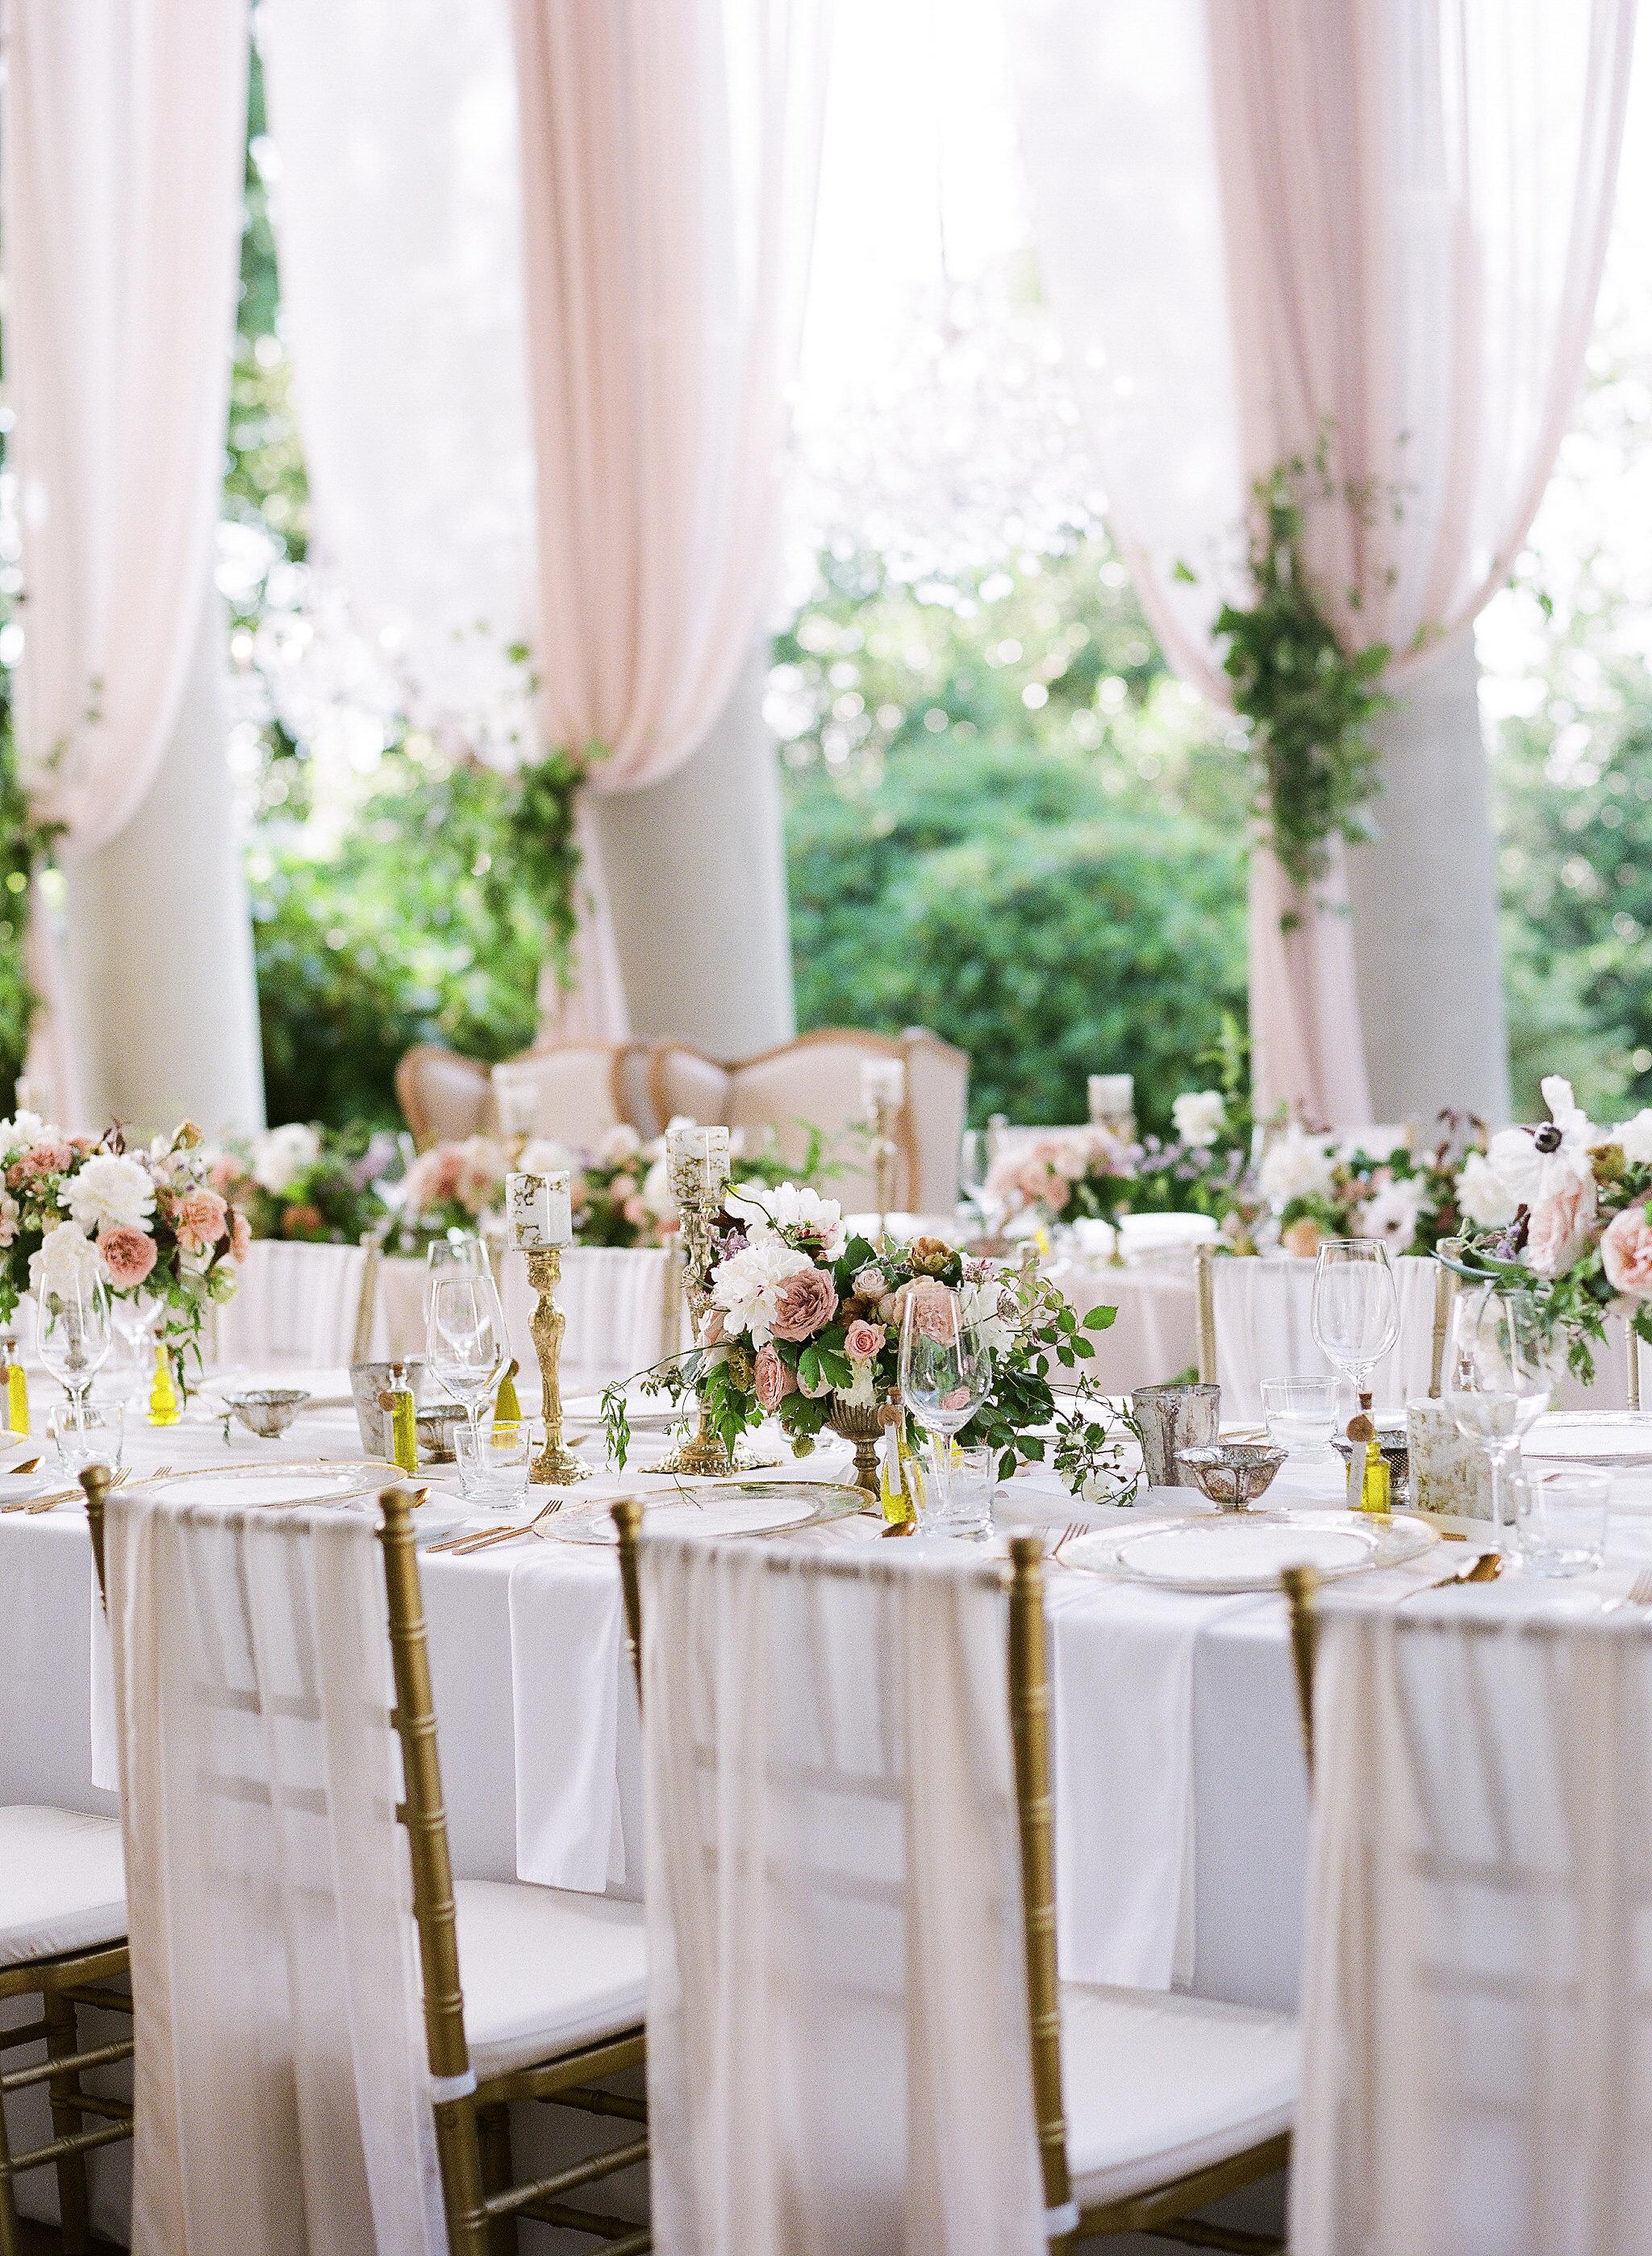 gloria zee wedding reception plates chairs centerpieces